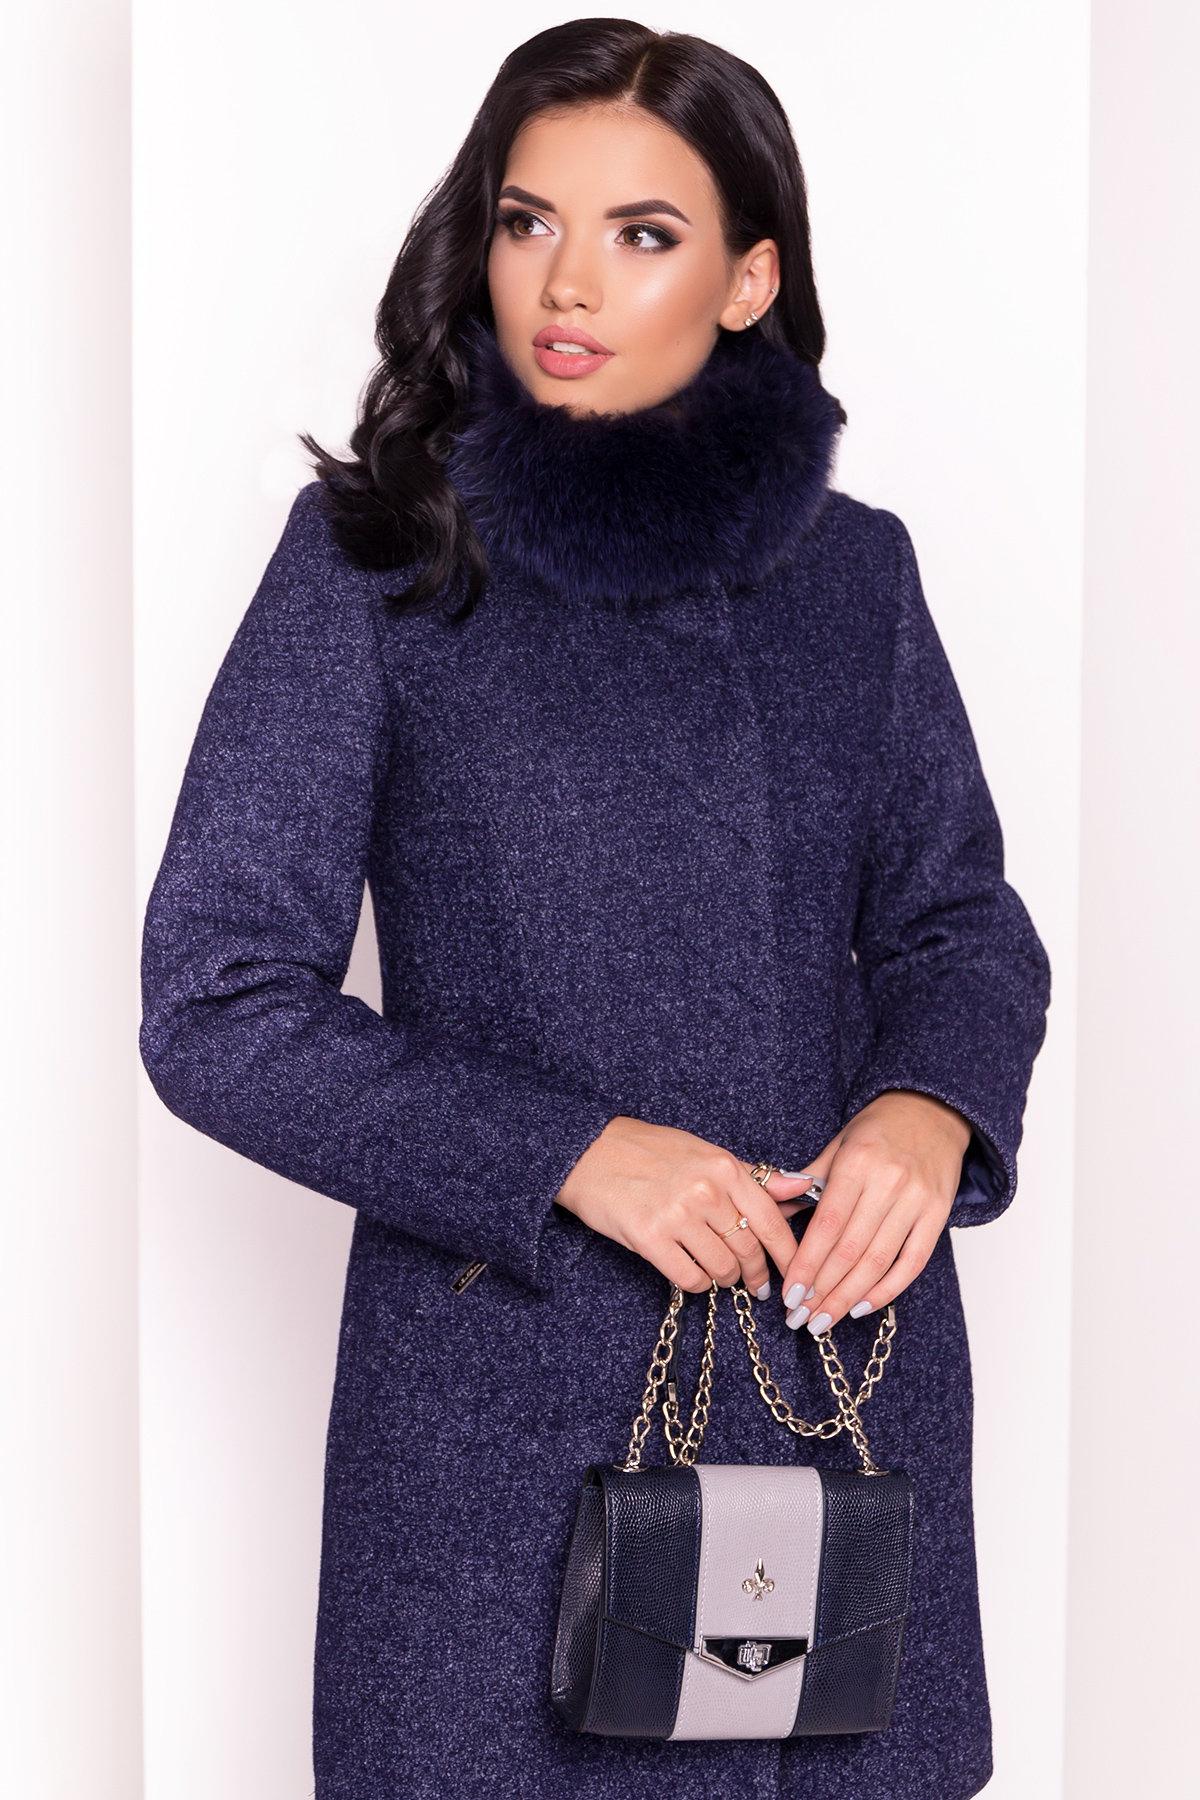 Пальто зима Сплит 3359 АРТ. 18862 Цвет: Темно-синий - фото 3, интернет магазин tm-modus.ru